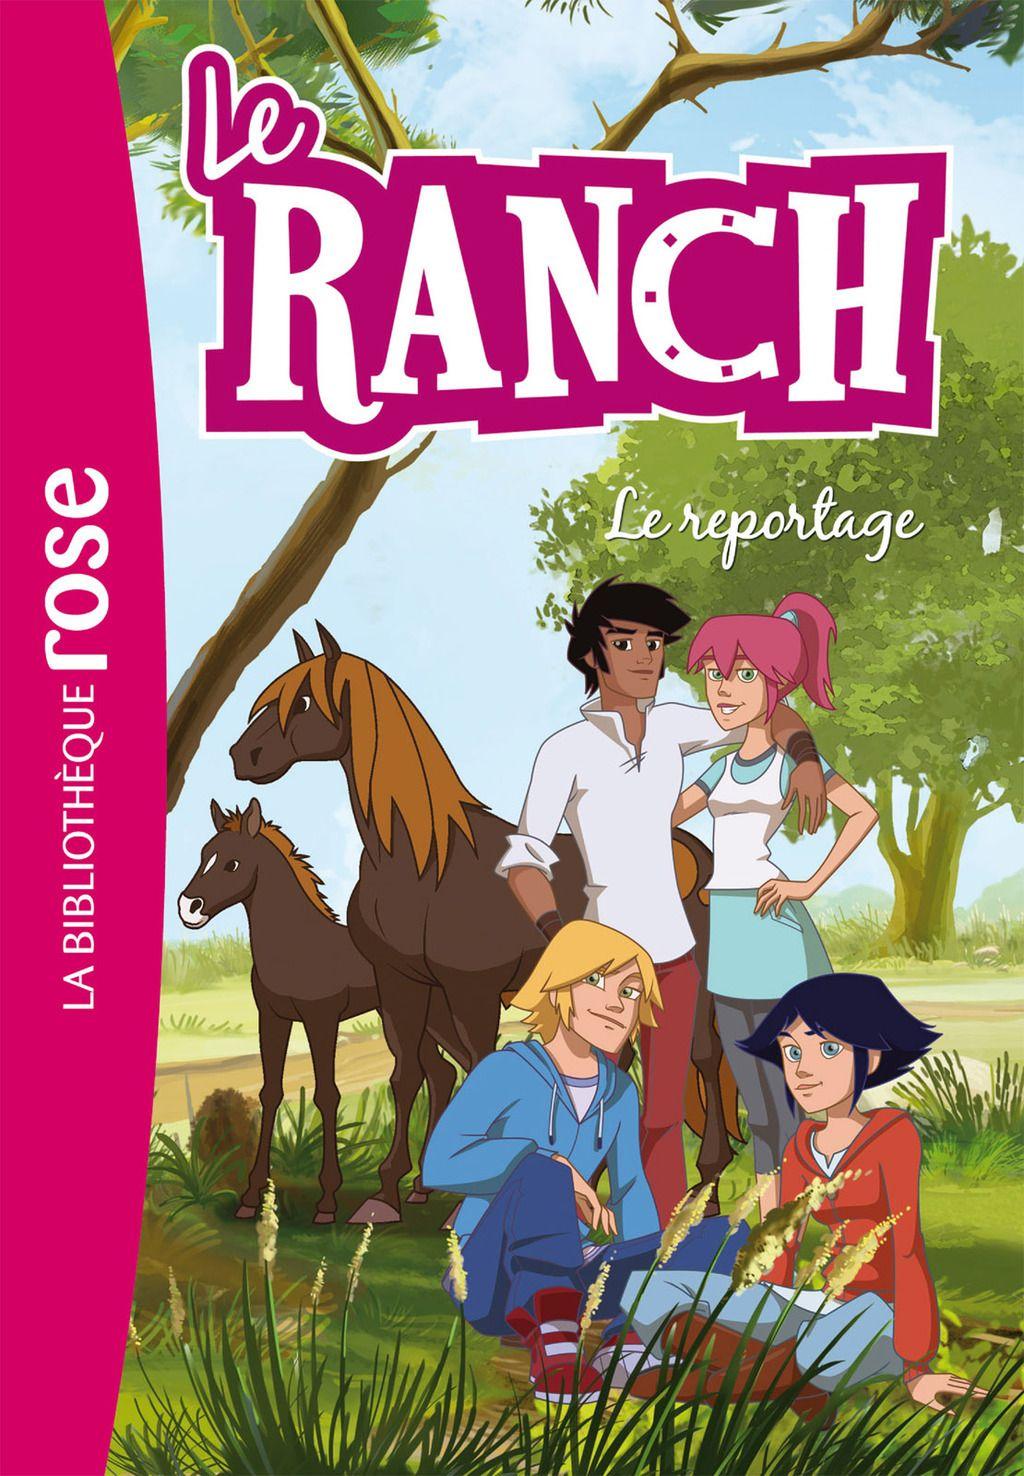 Le Ranch 10 Le Reportage Ebook Children Images Ranch Horse Animation